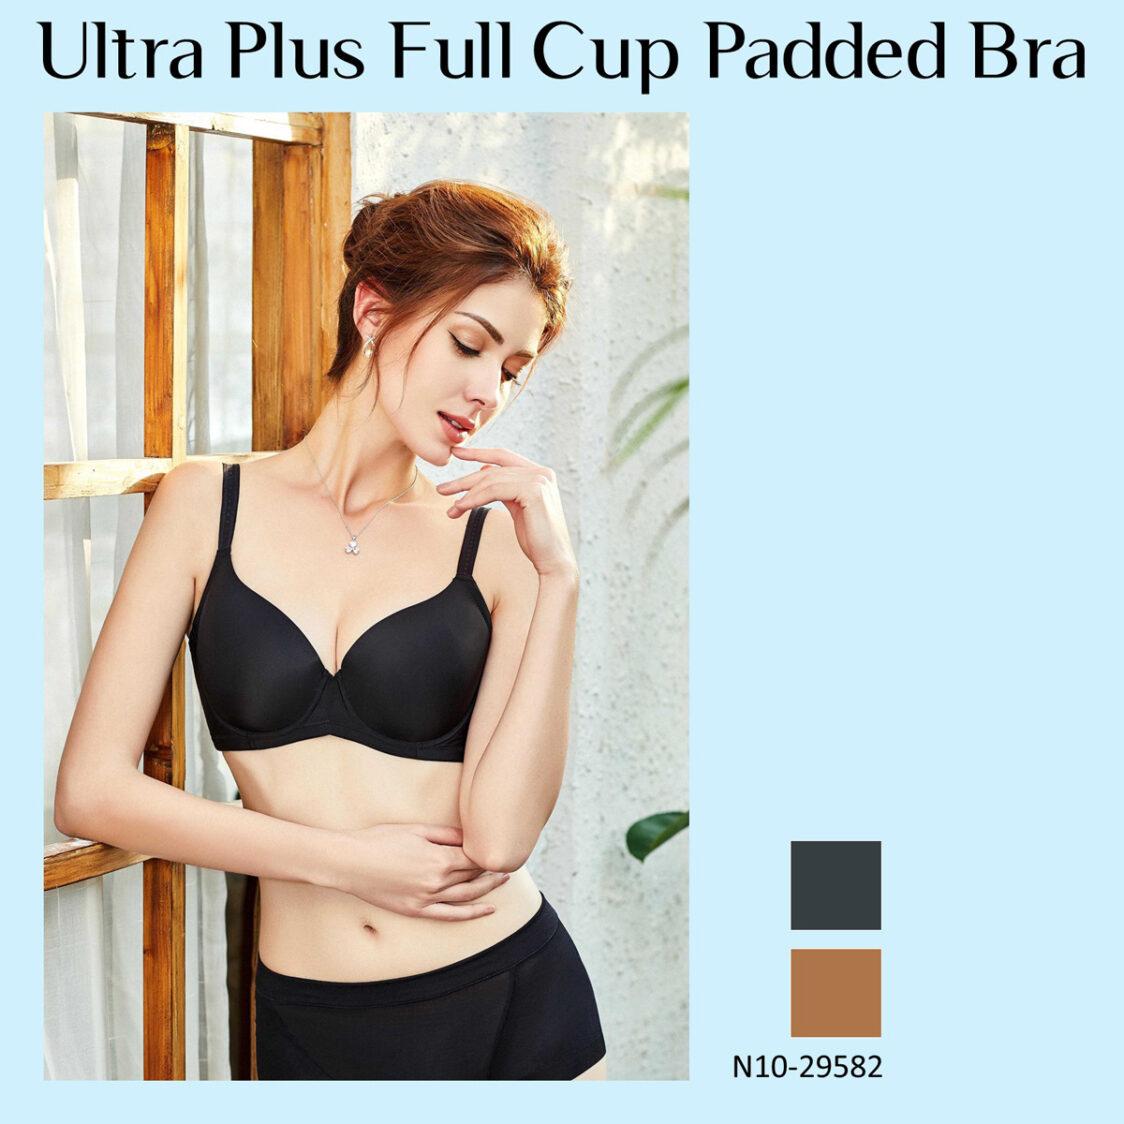 Ultra Plus Full Cup Padded Bra N10-29582BLK Black